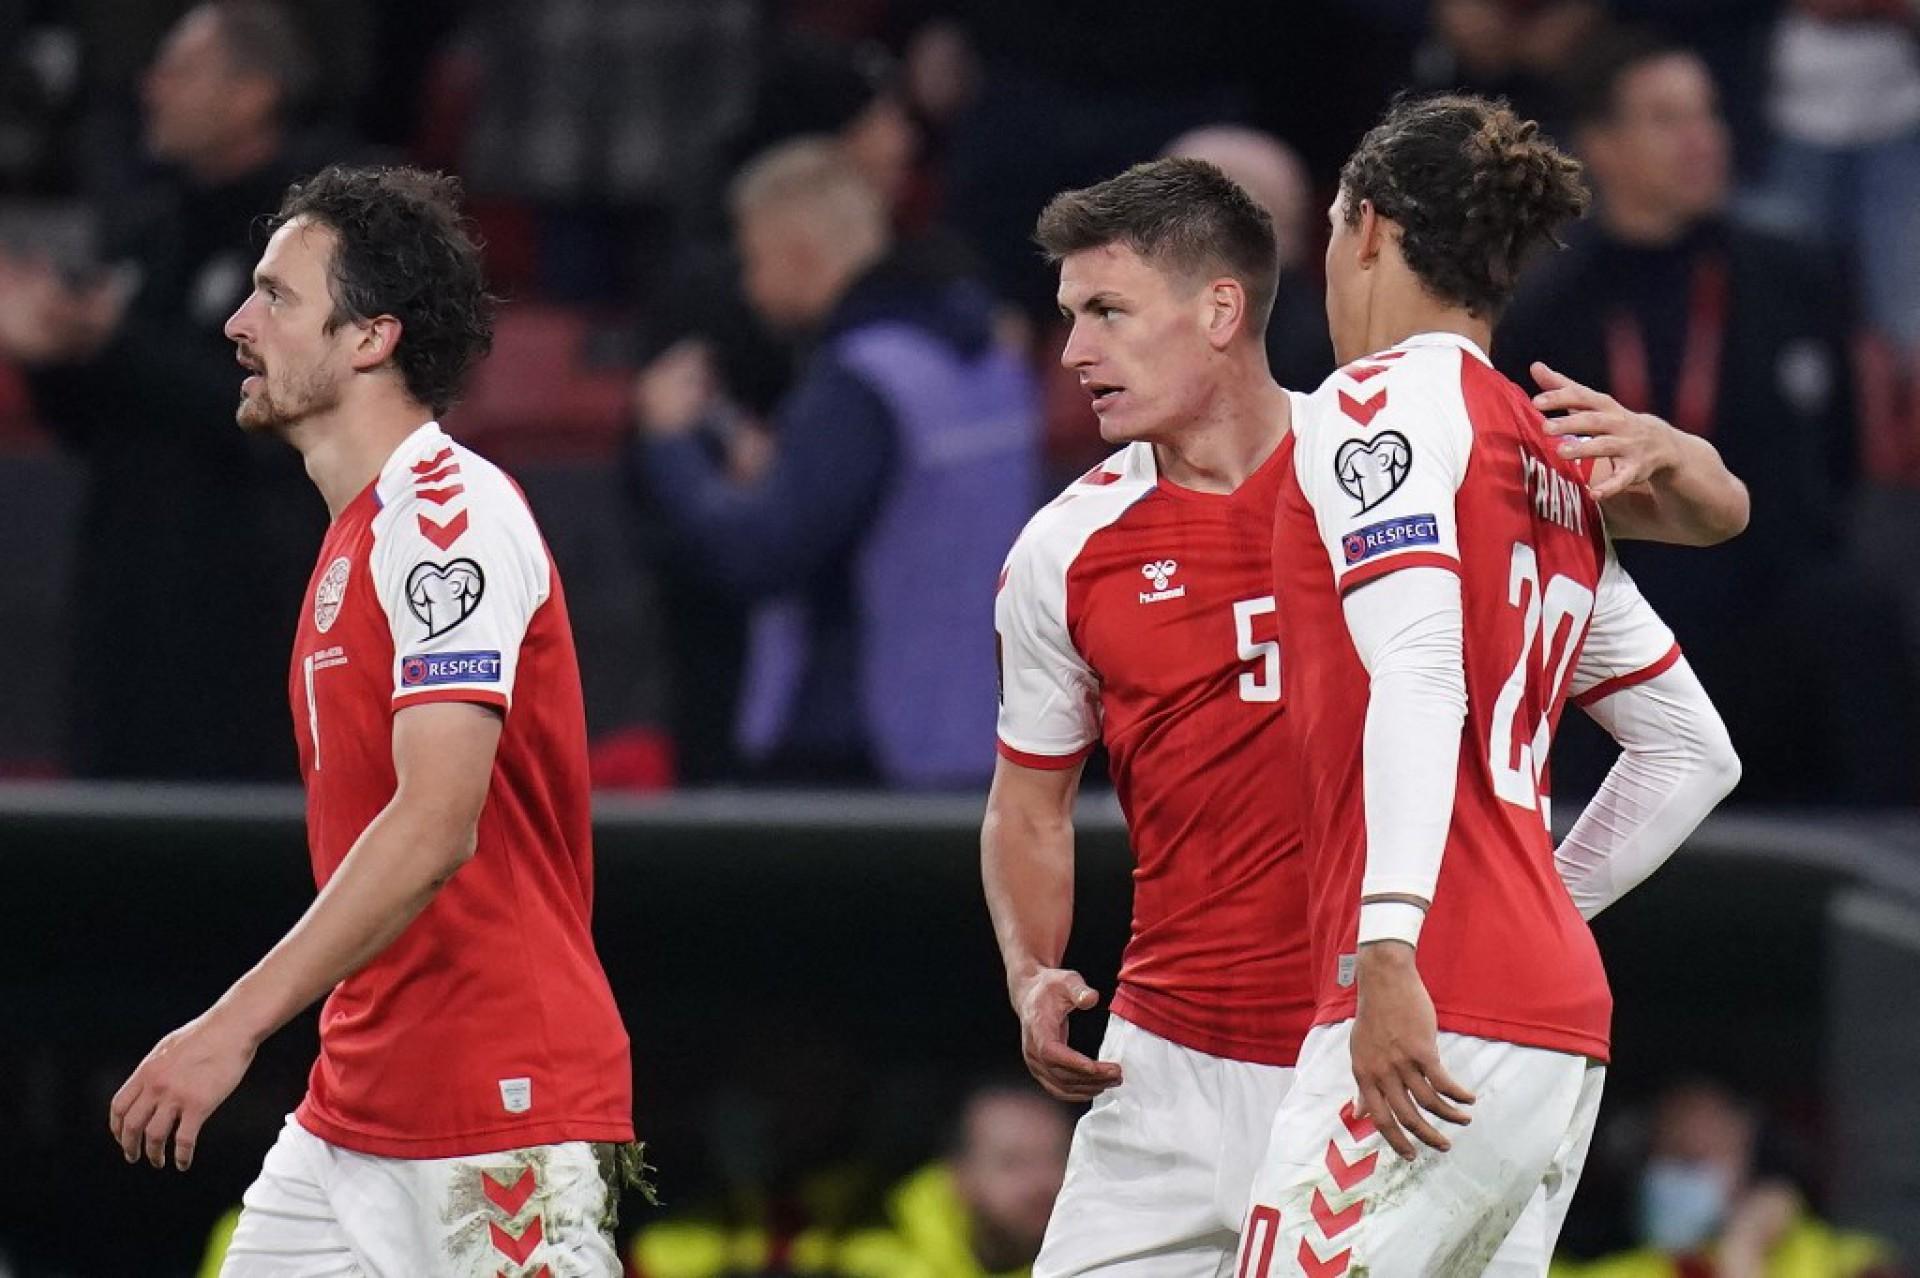 Maehle (camisa 5) marcou o gol da vitória dinamarquesa sobre a Áustria (Foto: Liselotte Sabroe / Ritzau Scanpix / AFP)